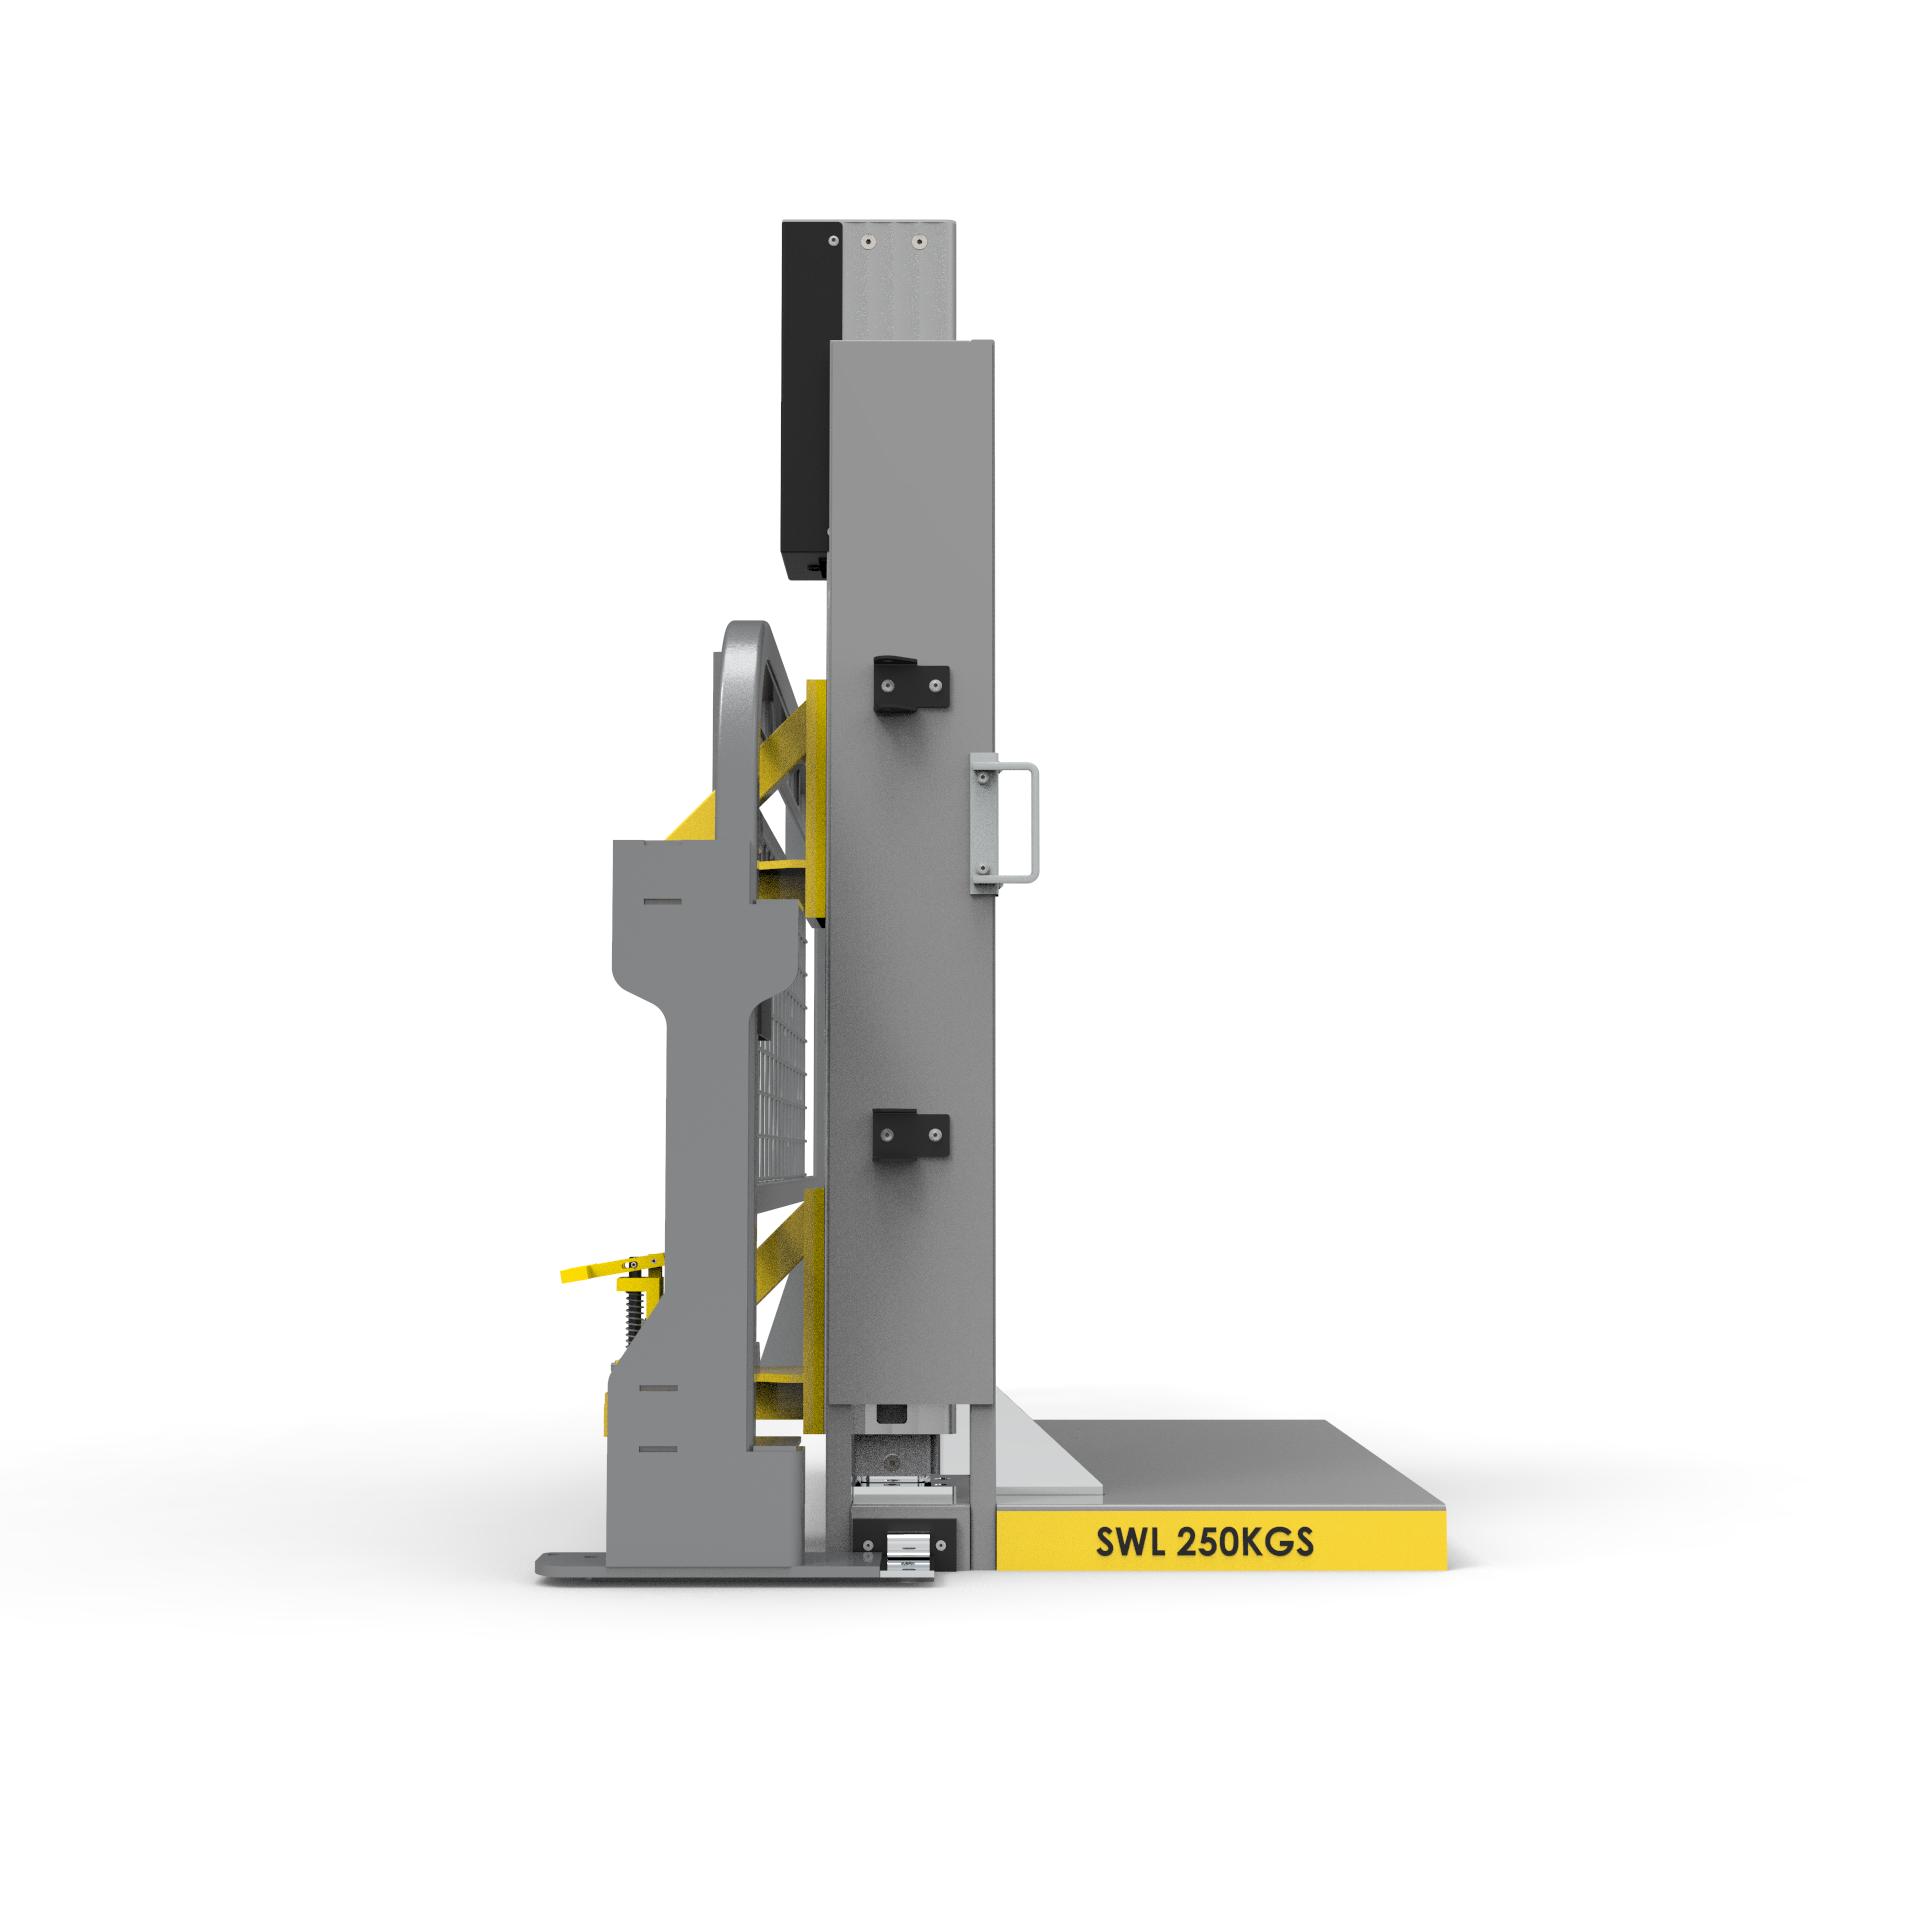 EZ Lift-N-Load side lifter profile